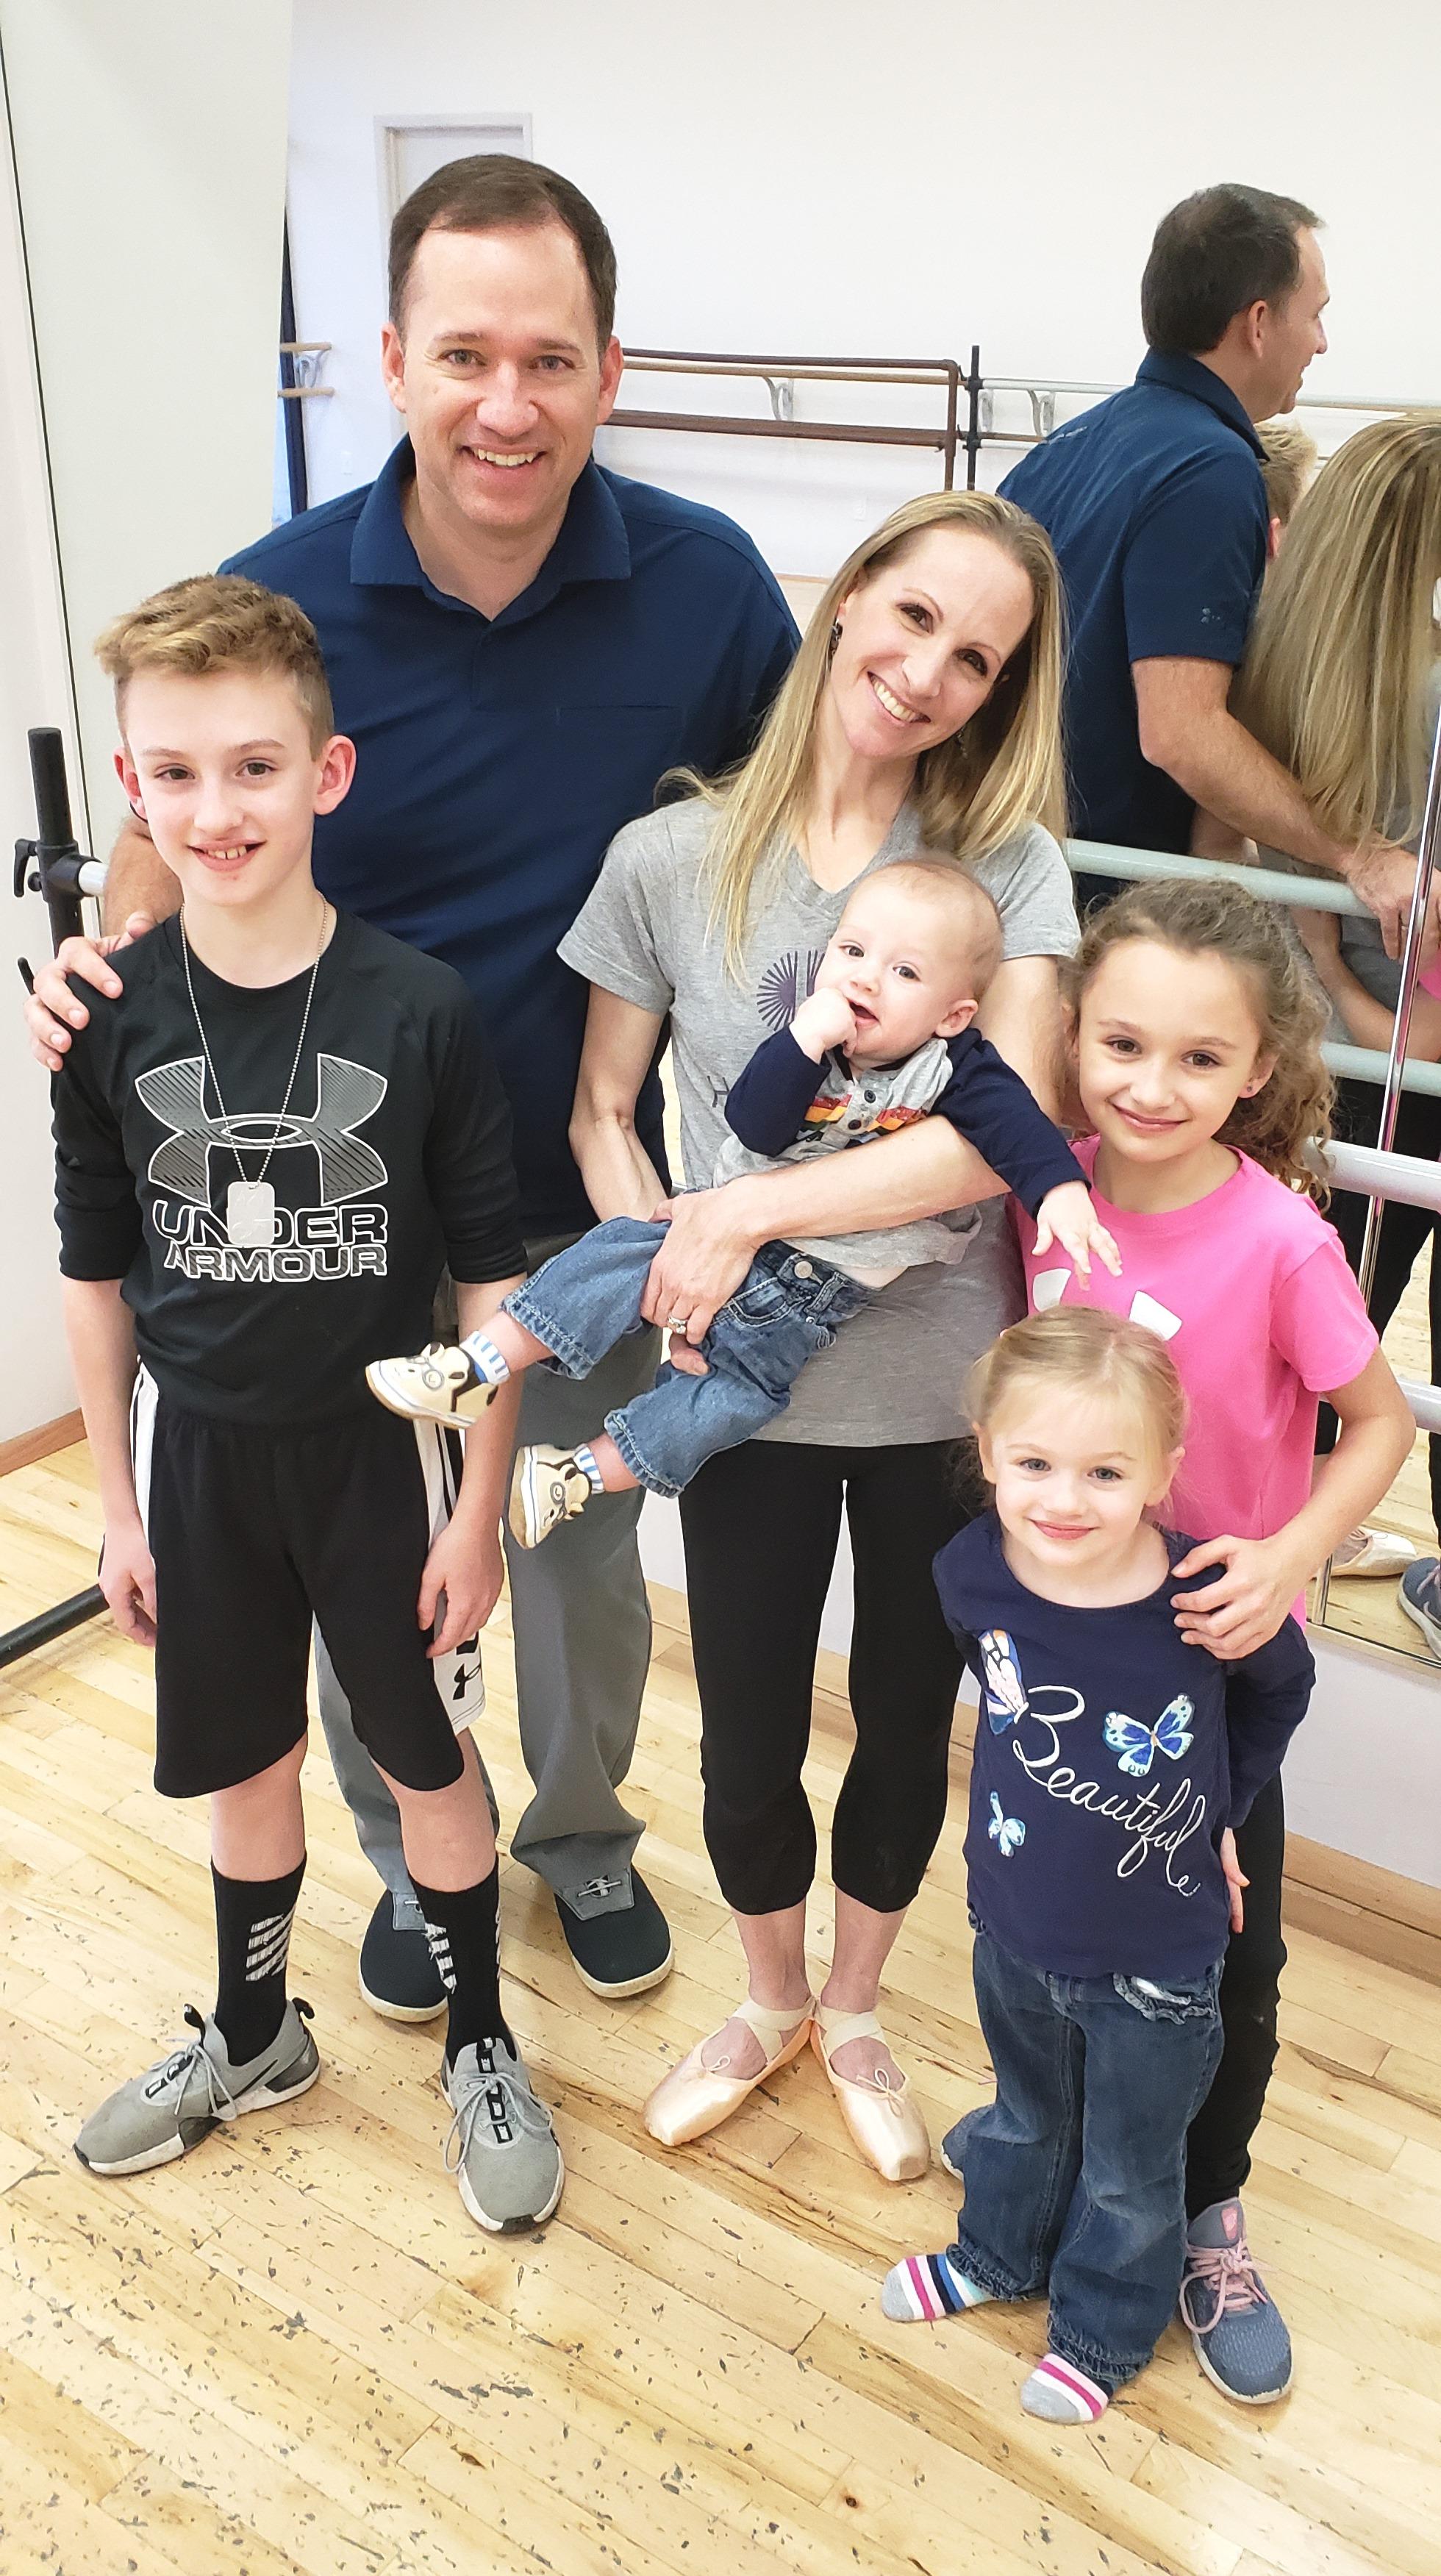 Sara Webb Bardo - the Bardo family at home in a dance studio.